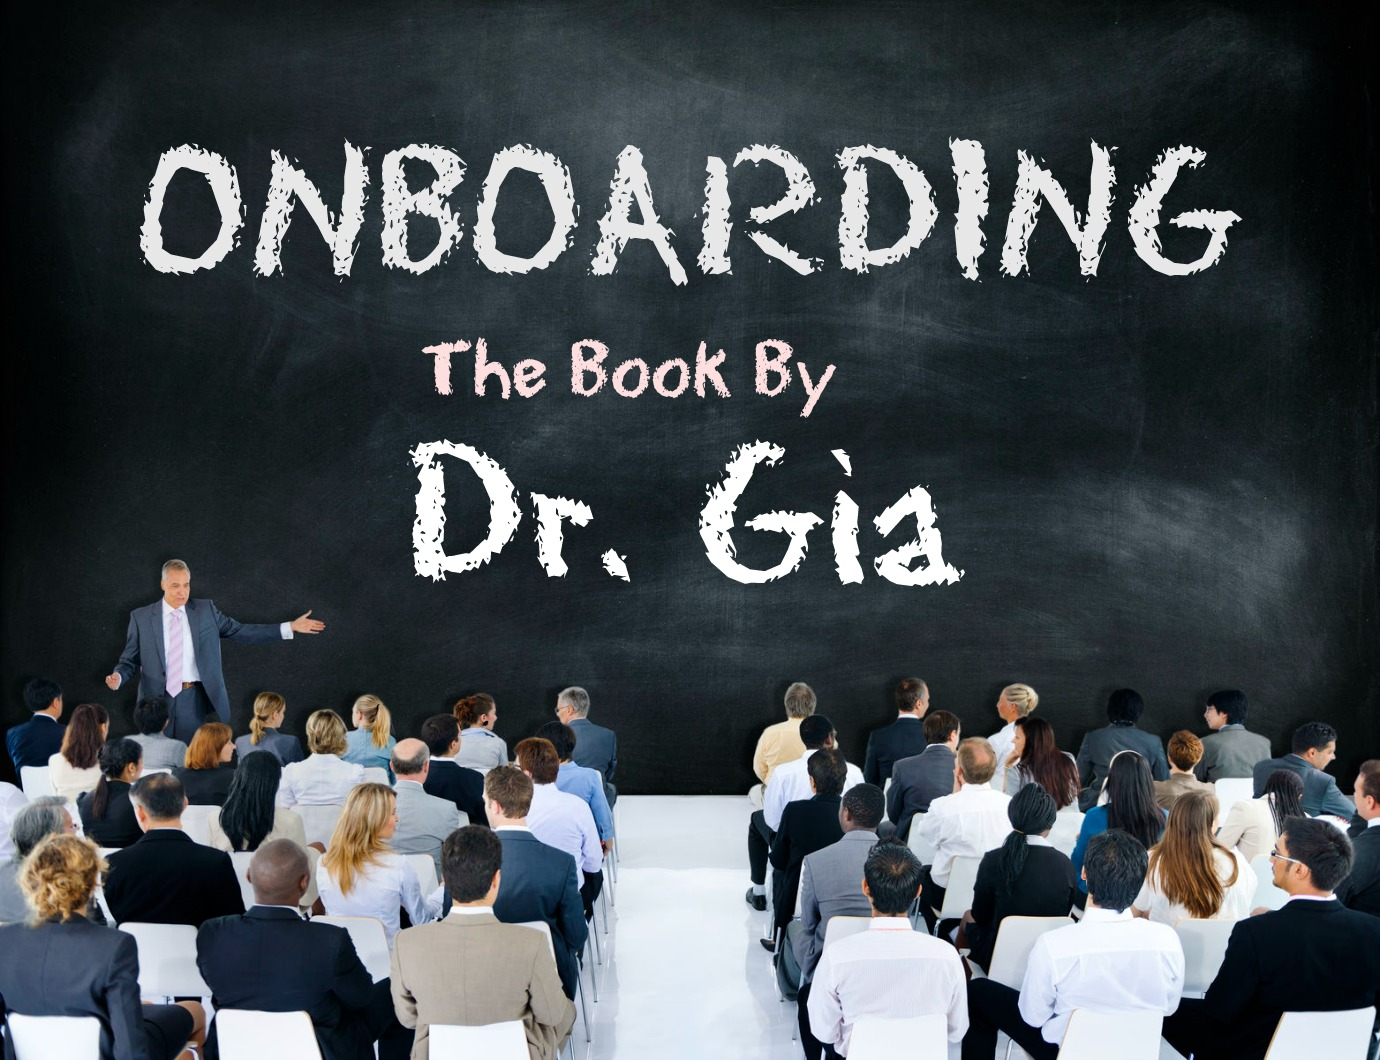 Dr. Gia Book Blackboard Resized